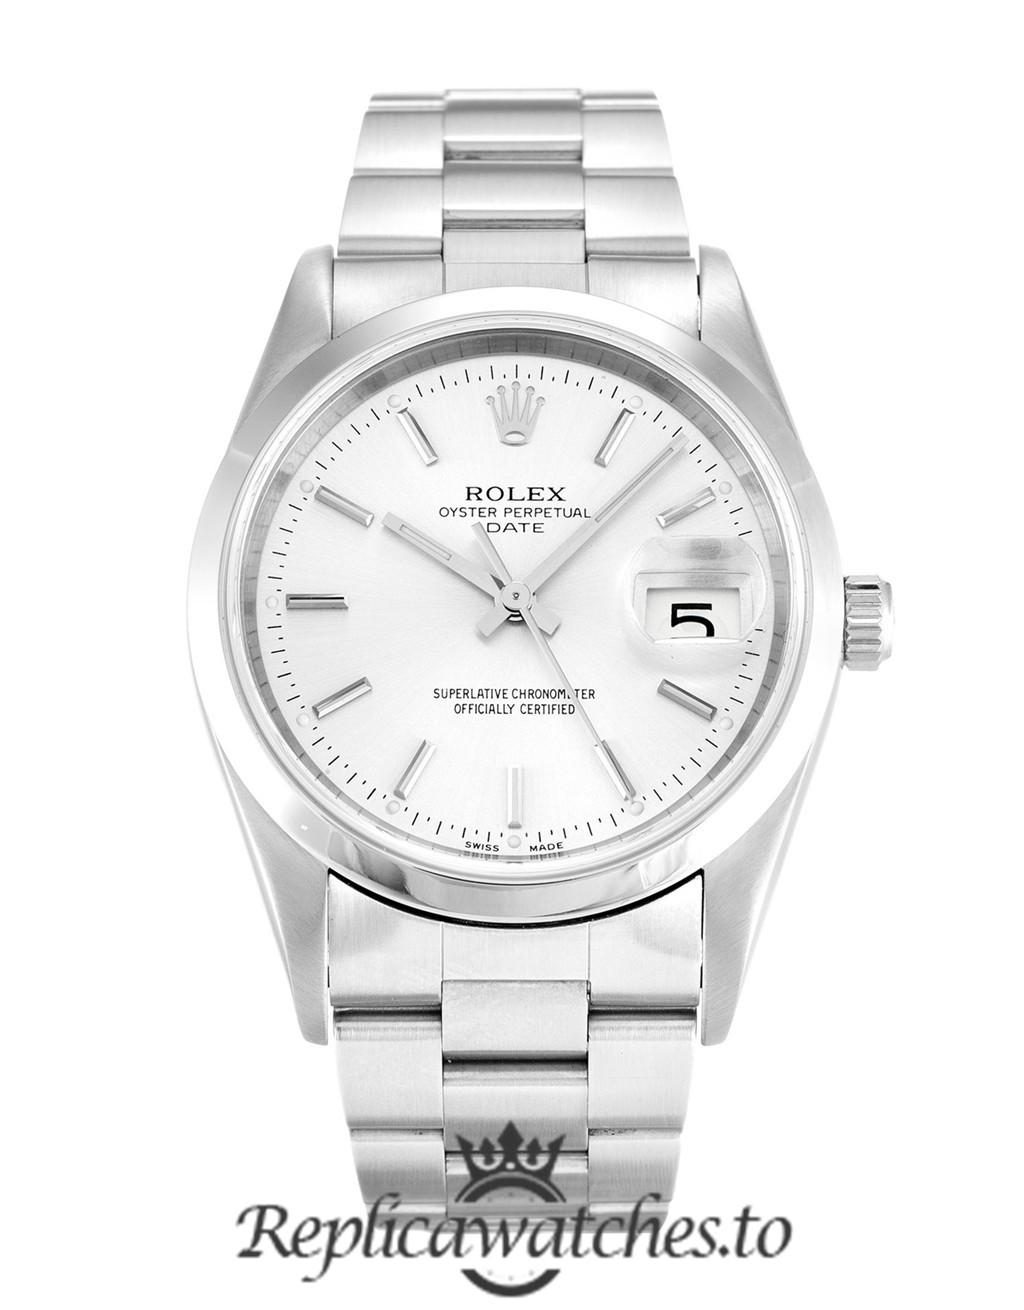 Rolex Oyster Perpetual Replica 15200 002 Silver Strap 34MM